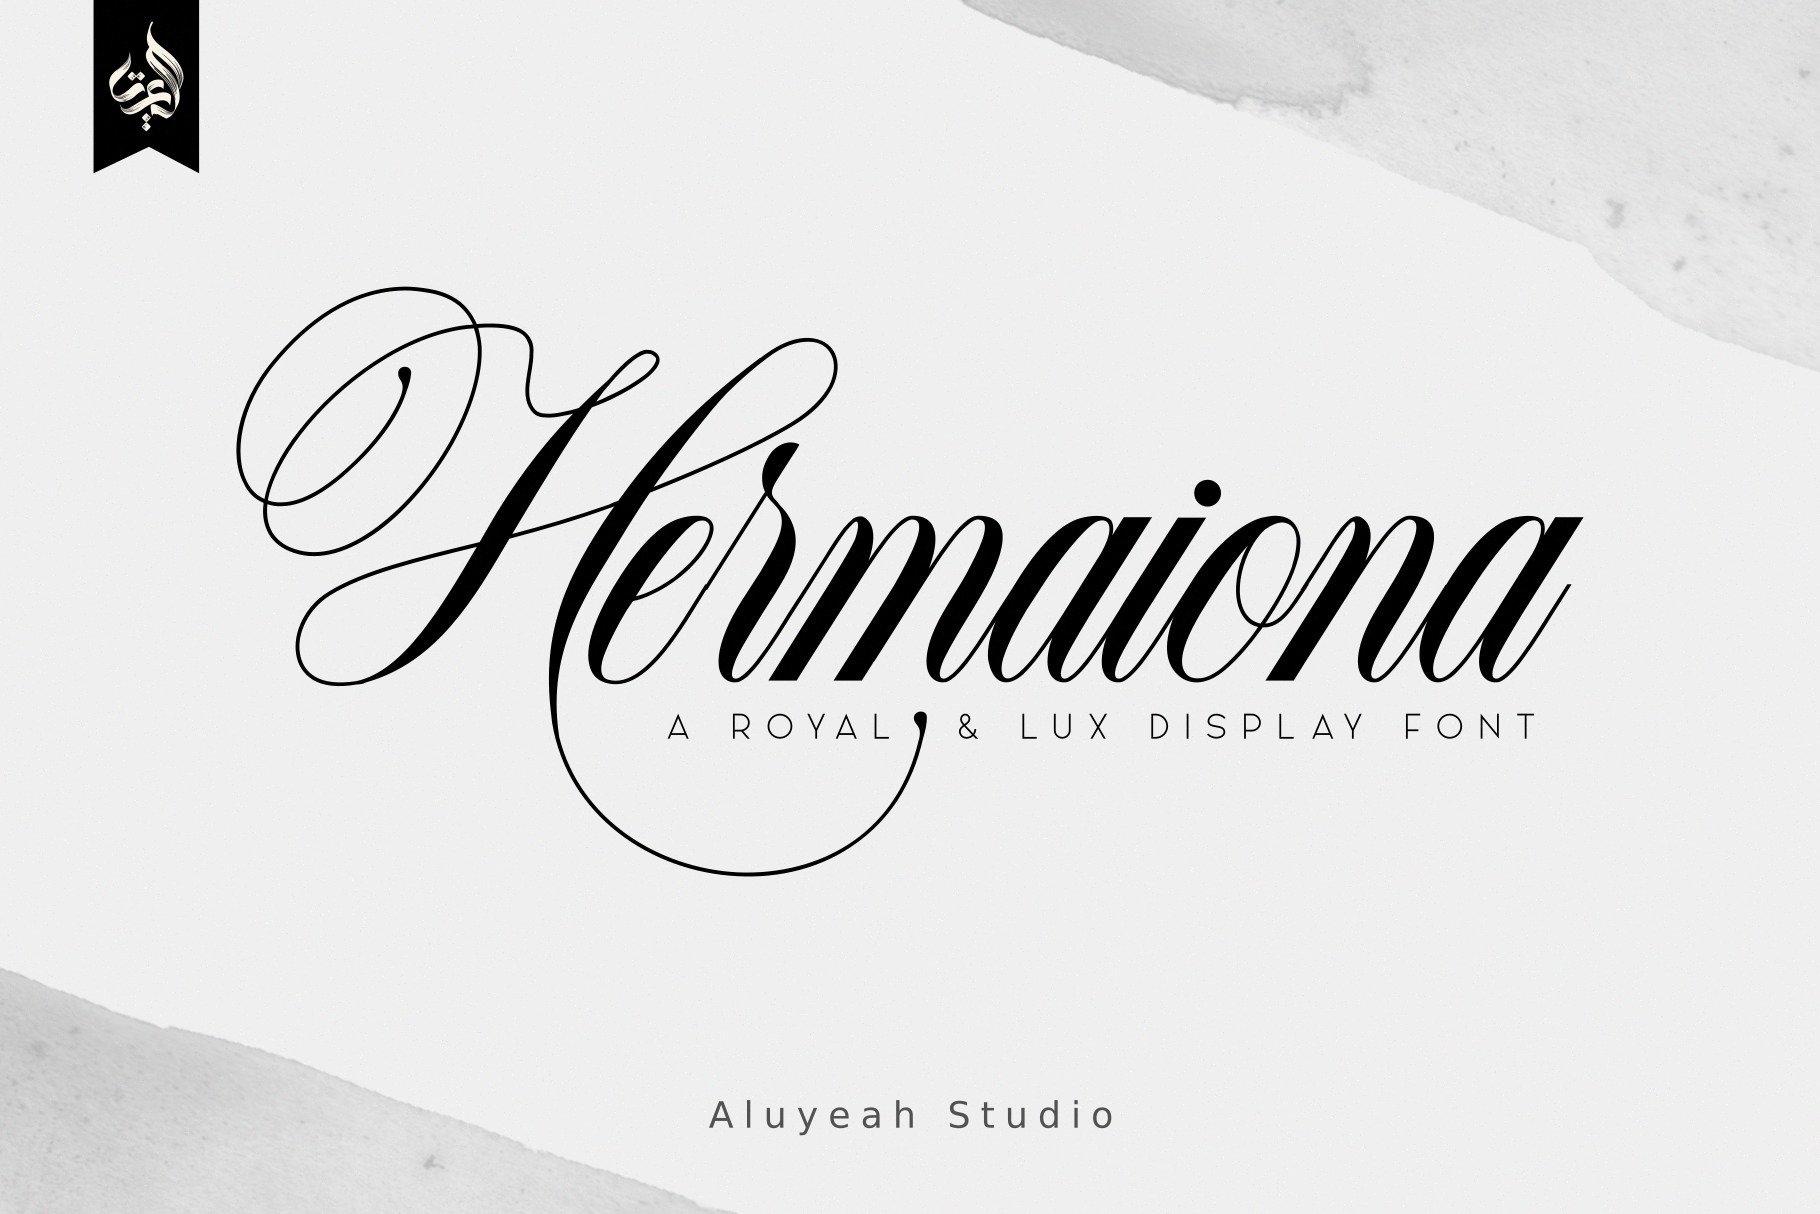 AL Hermaiona example image 1